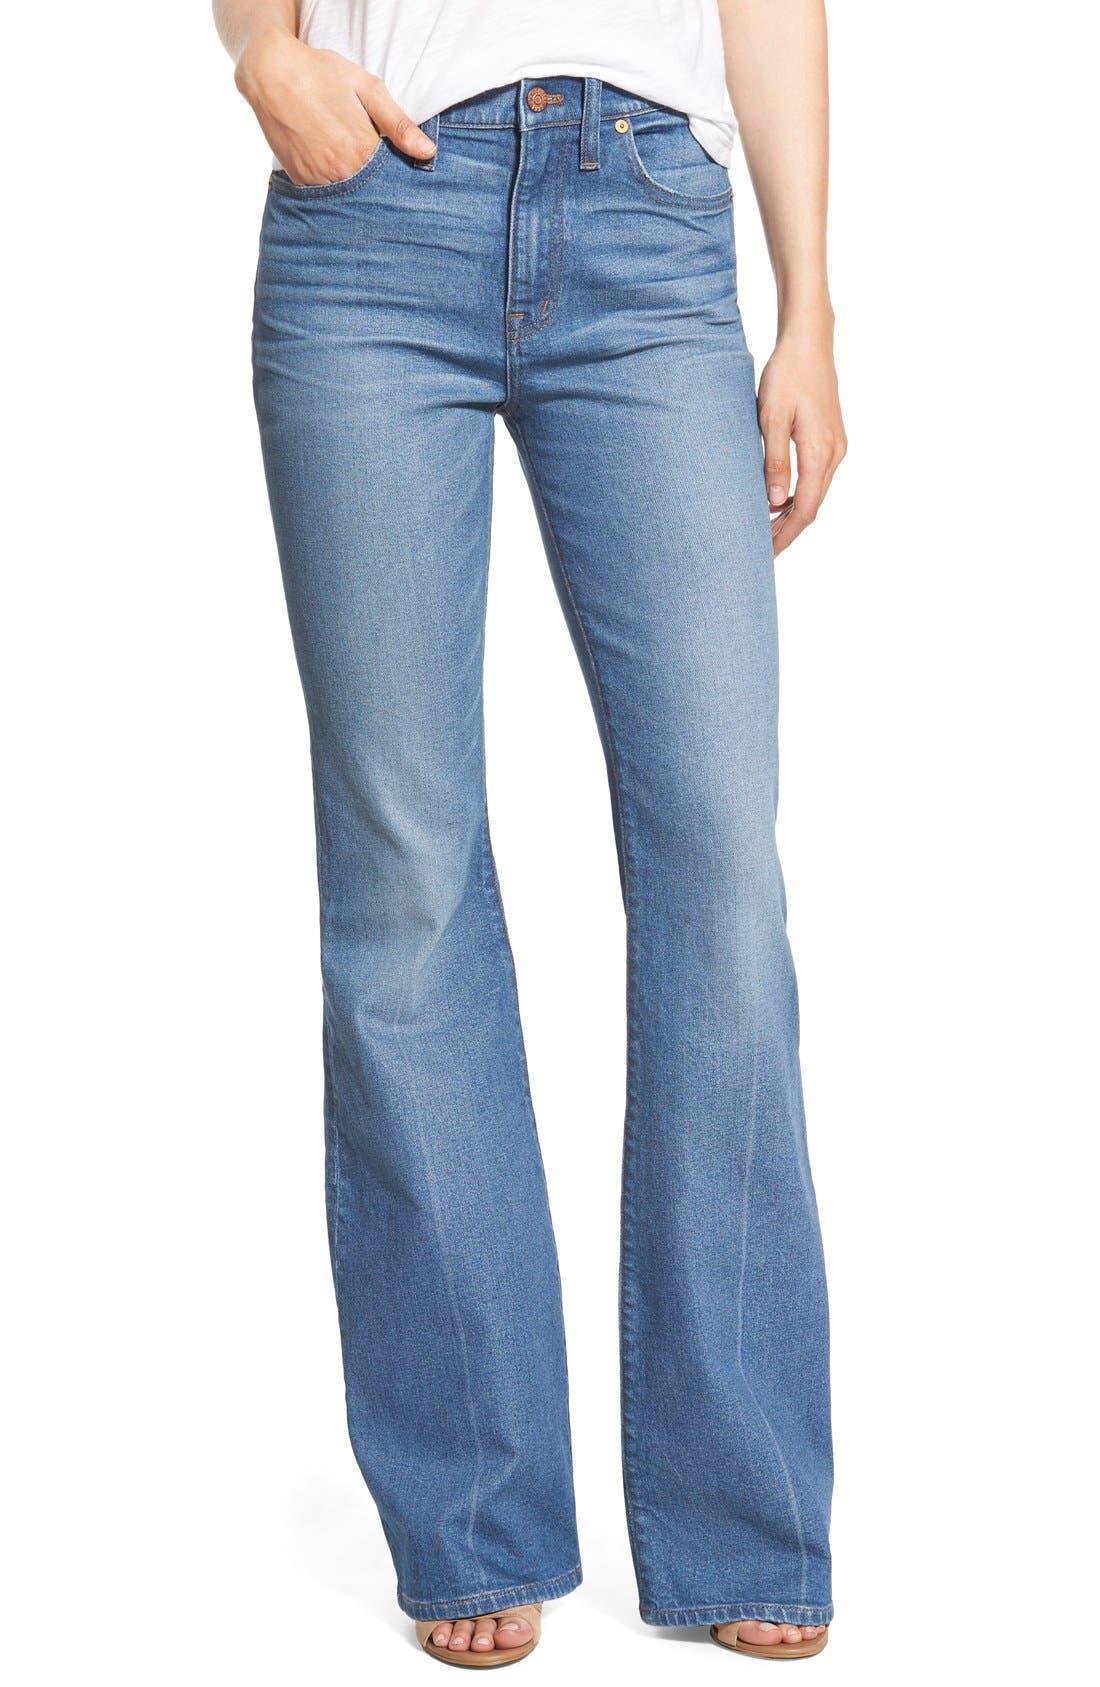 'Flea Market' Flare Jeans,                             Main thumbnail 1, color,                             Maribel